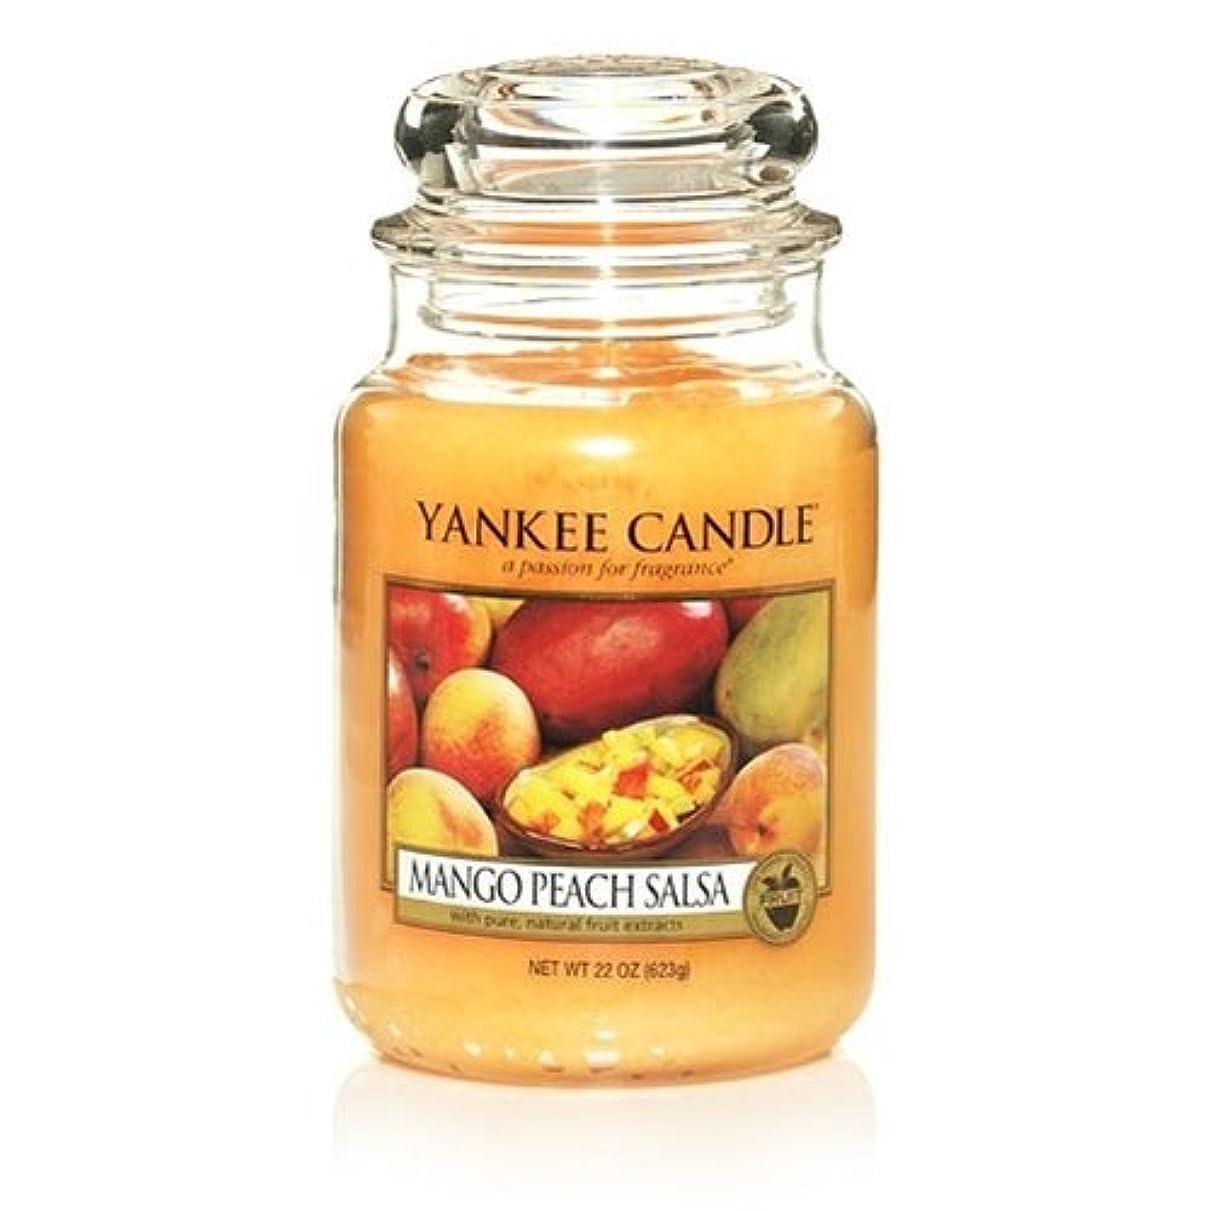 Yankee Candle 22-Ounce Jar Scented Candle, Large, Mango Peach Salsa [並行輸入品]